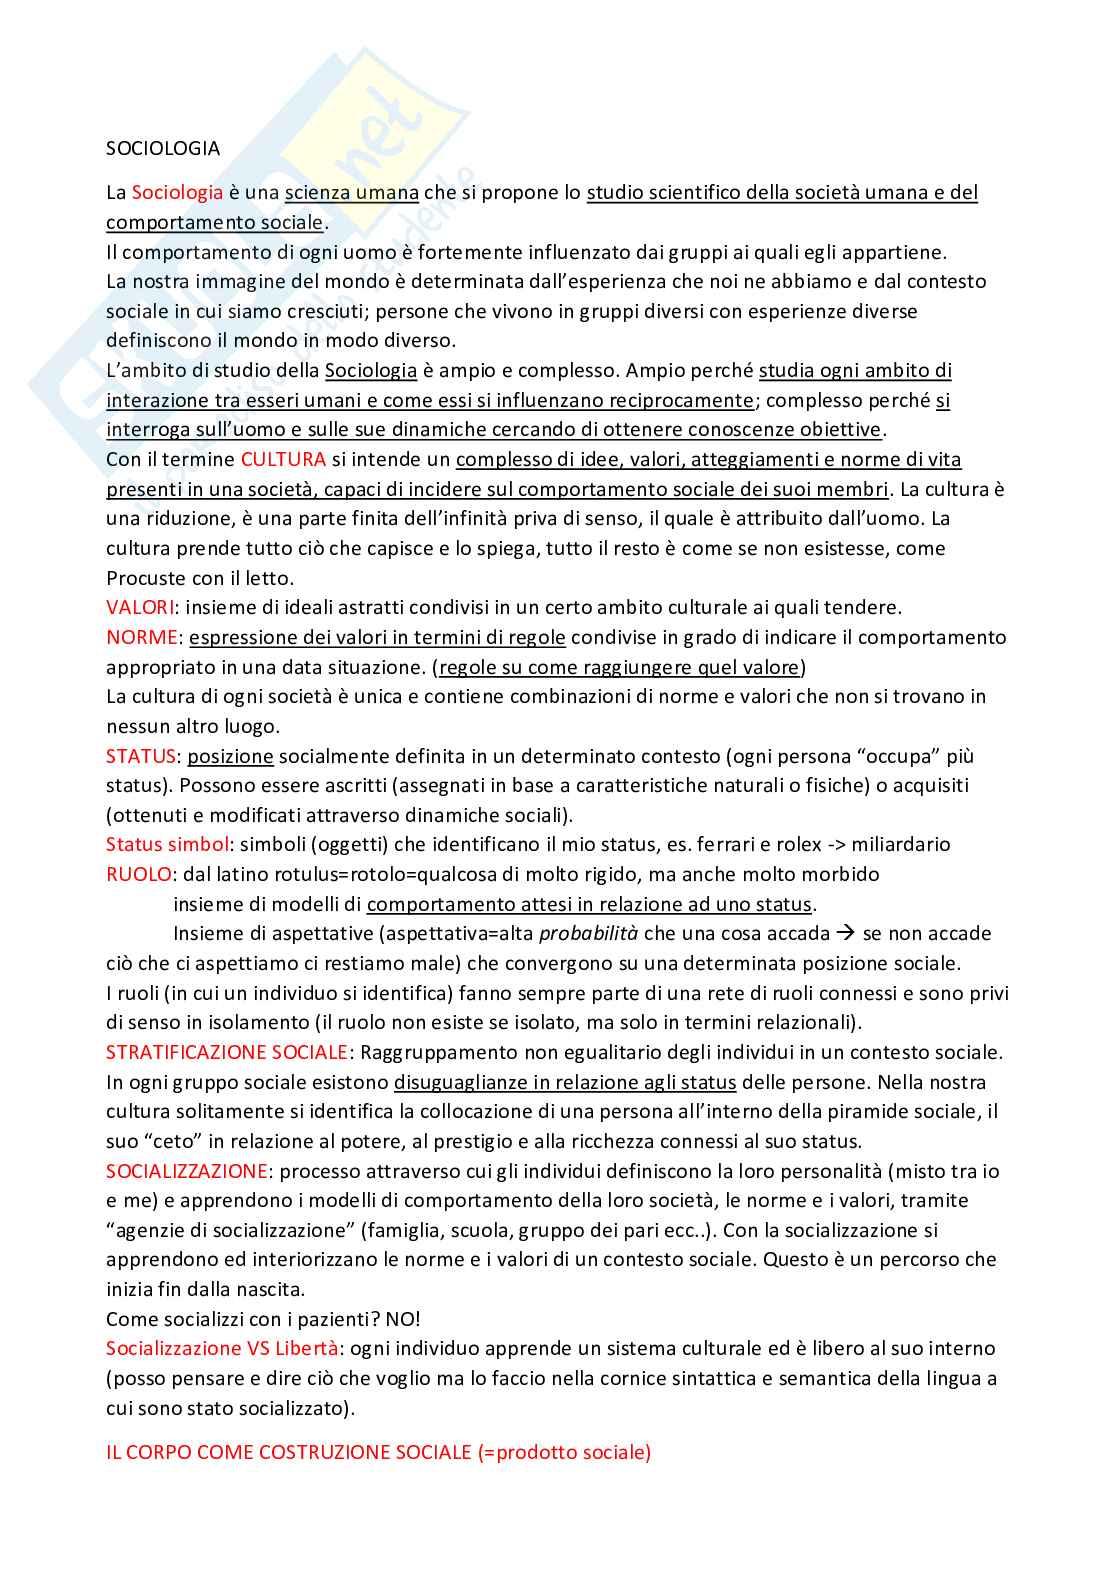 Riassunto di sociologia Pag. 1